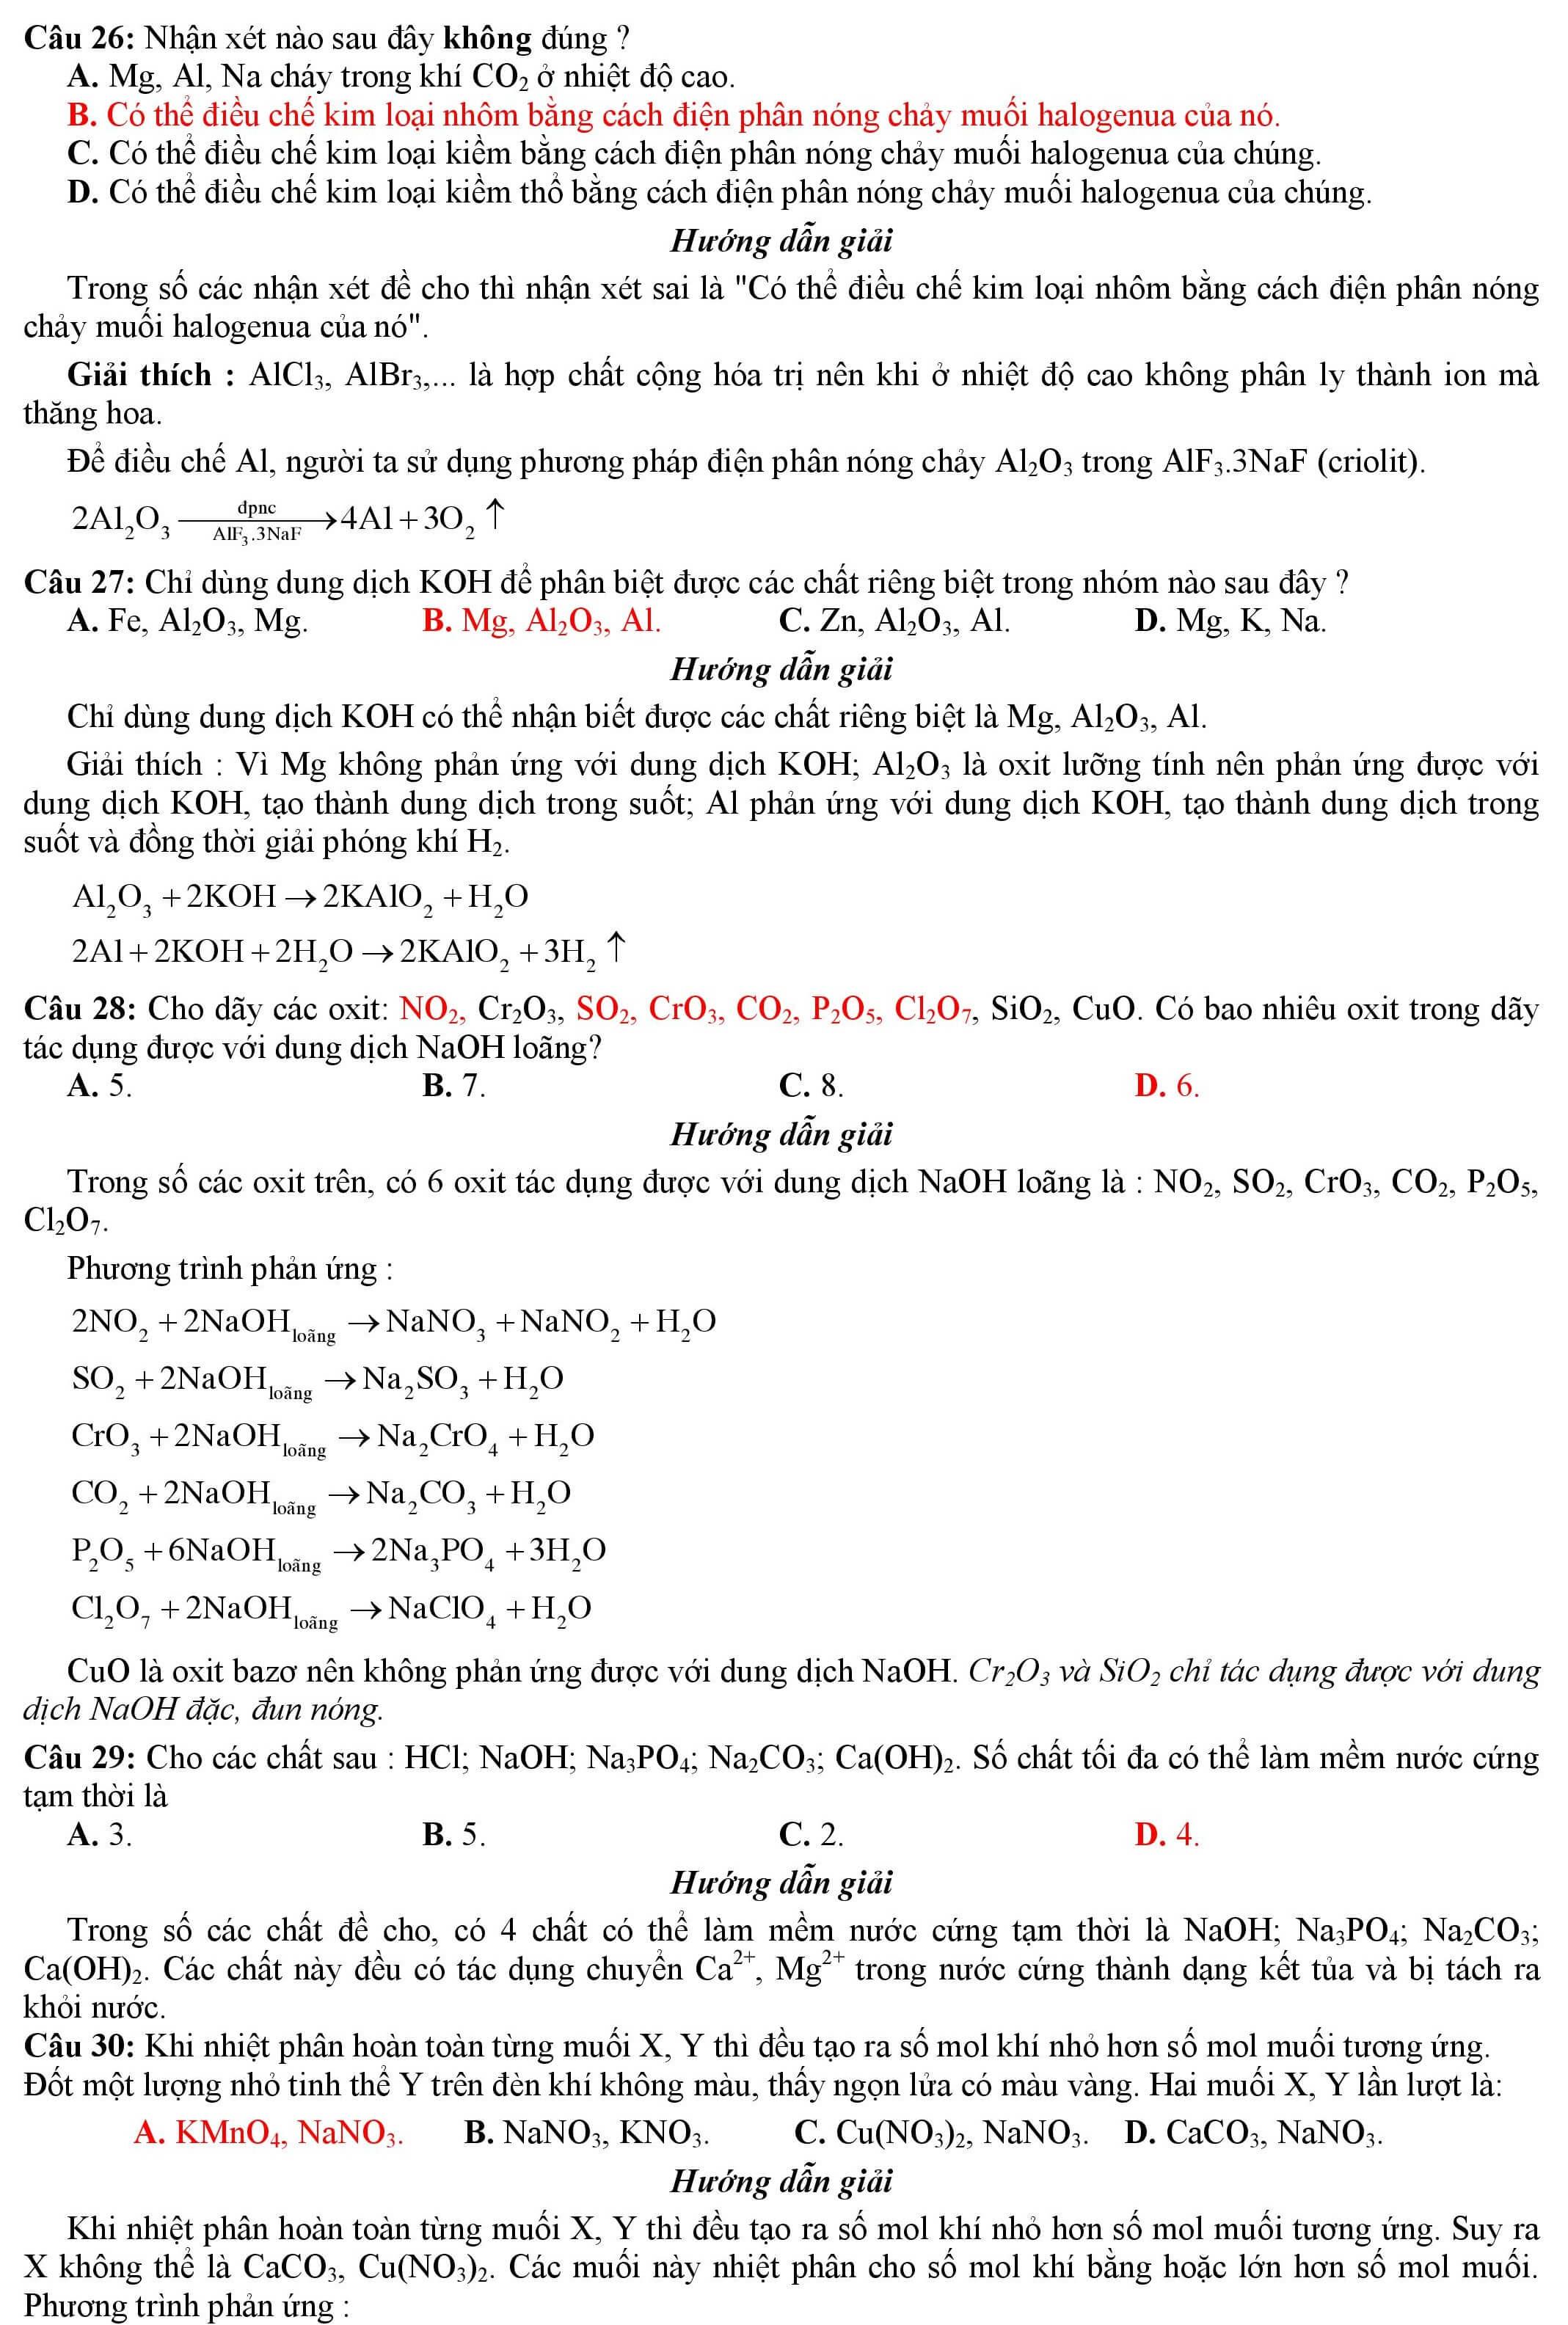 Kim loại kiềm và kim loại kiểm thổ (7).jpg